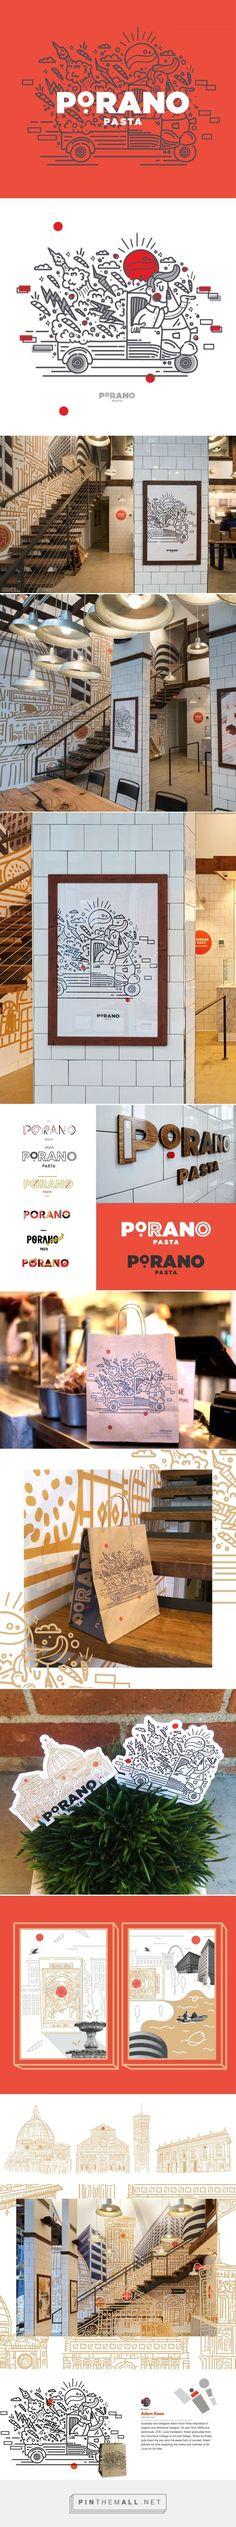 "Porano on Behance - created via <a href="""" rel=""nofollow"" target=""_blank""></a>"